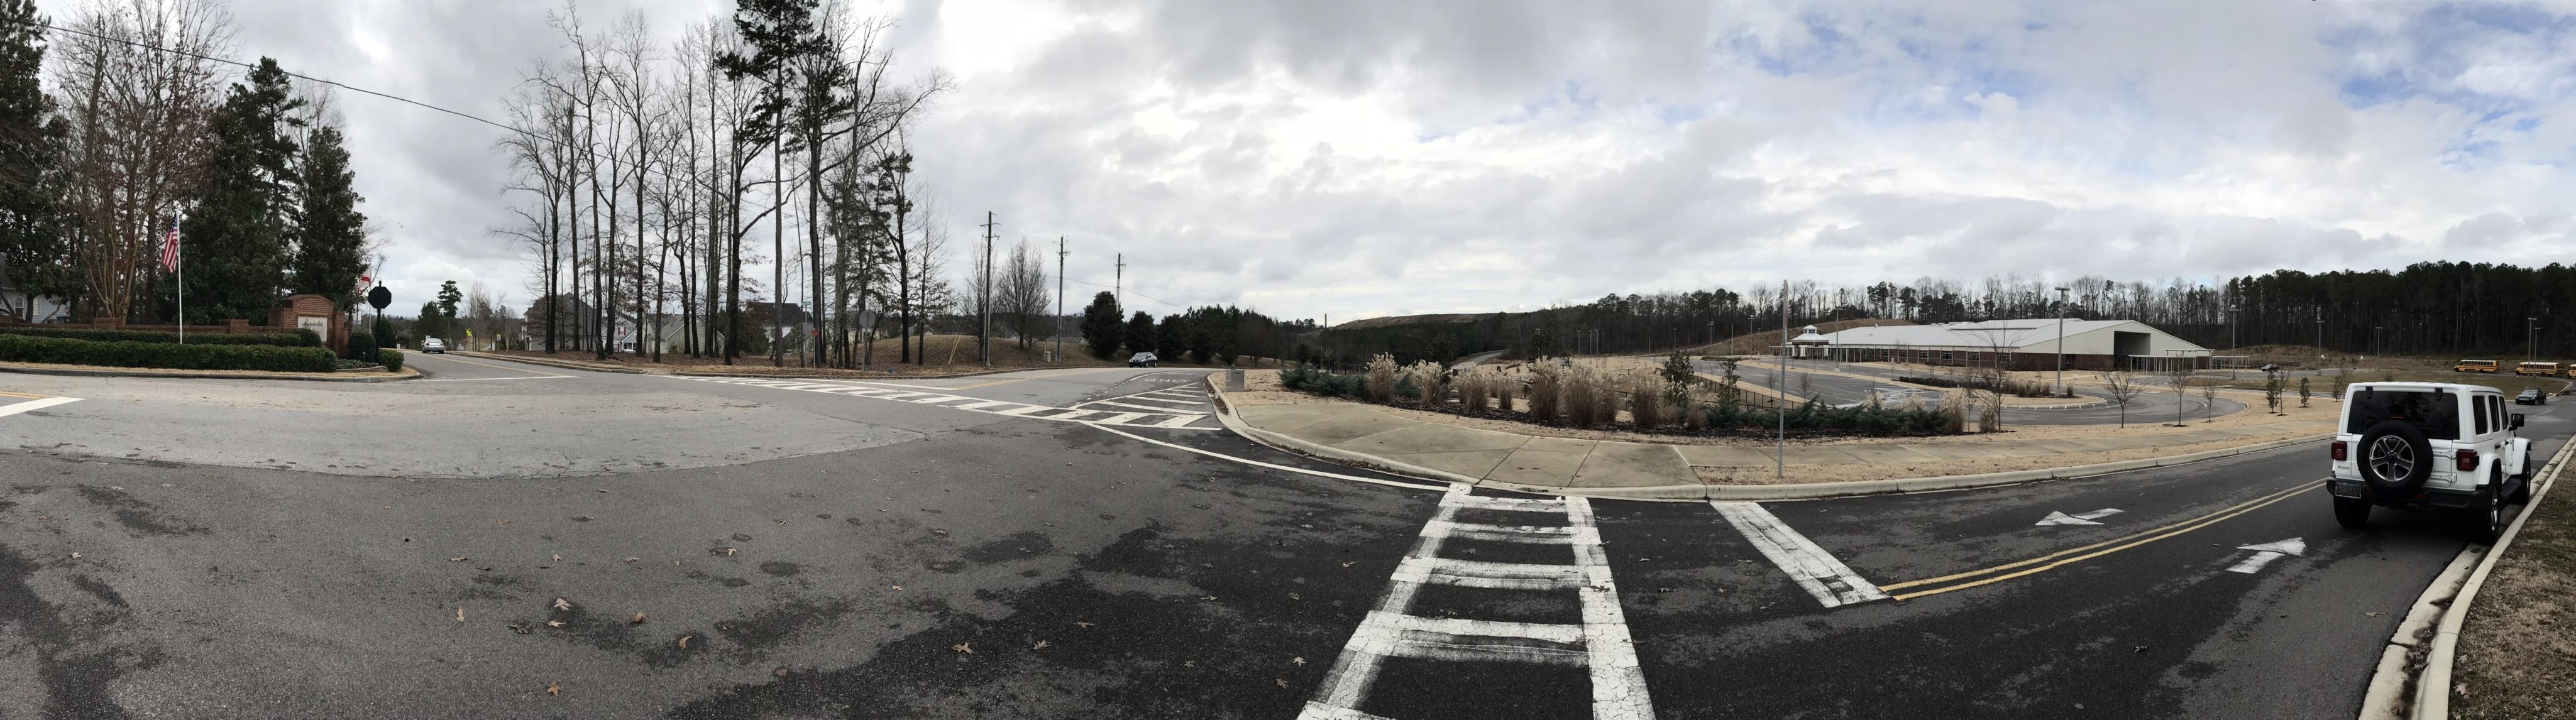 Magnolia Elementary intersection Trussville